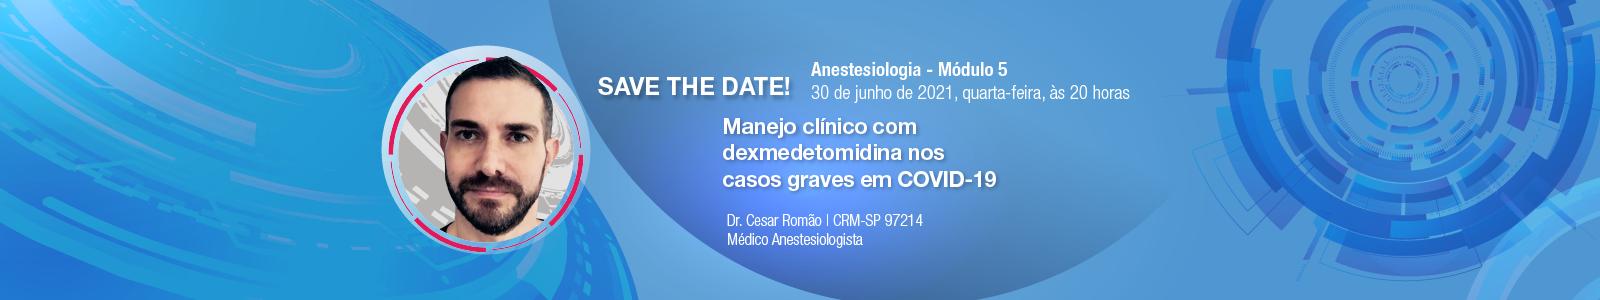 Visão Aché2021-banners anestesiologia-5